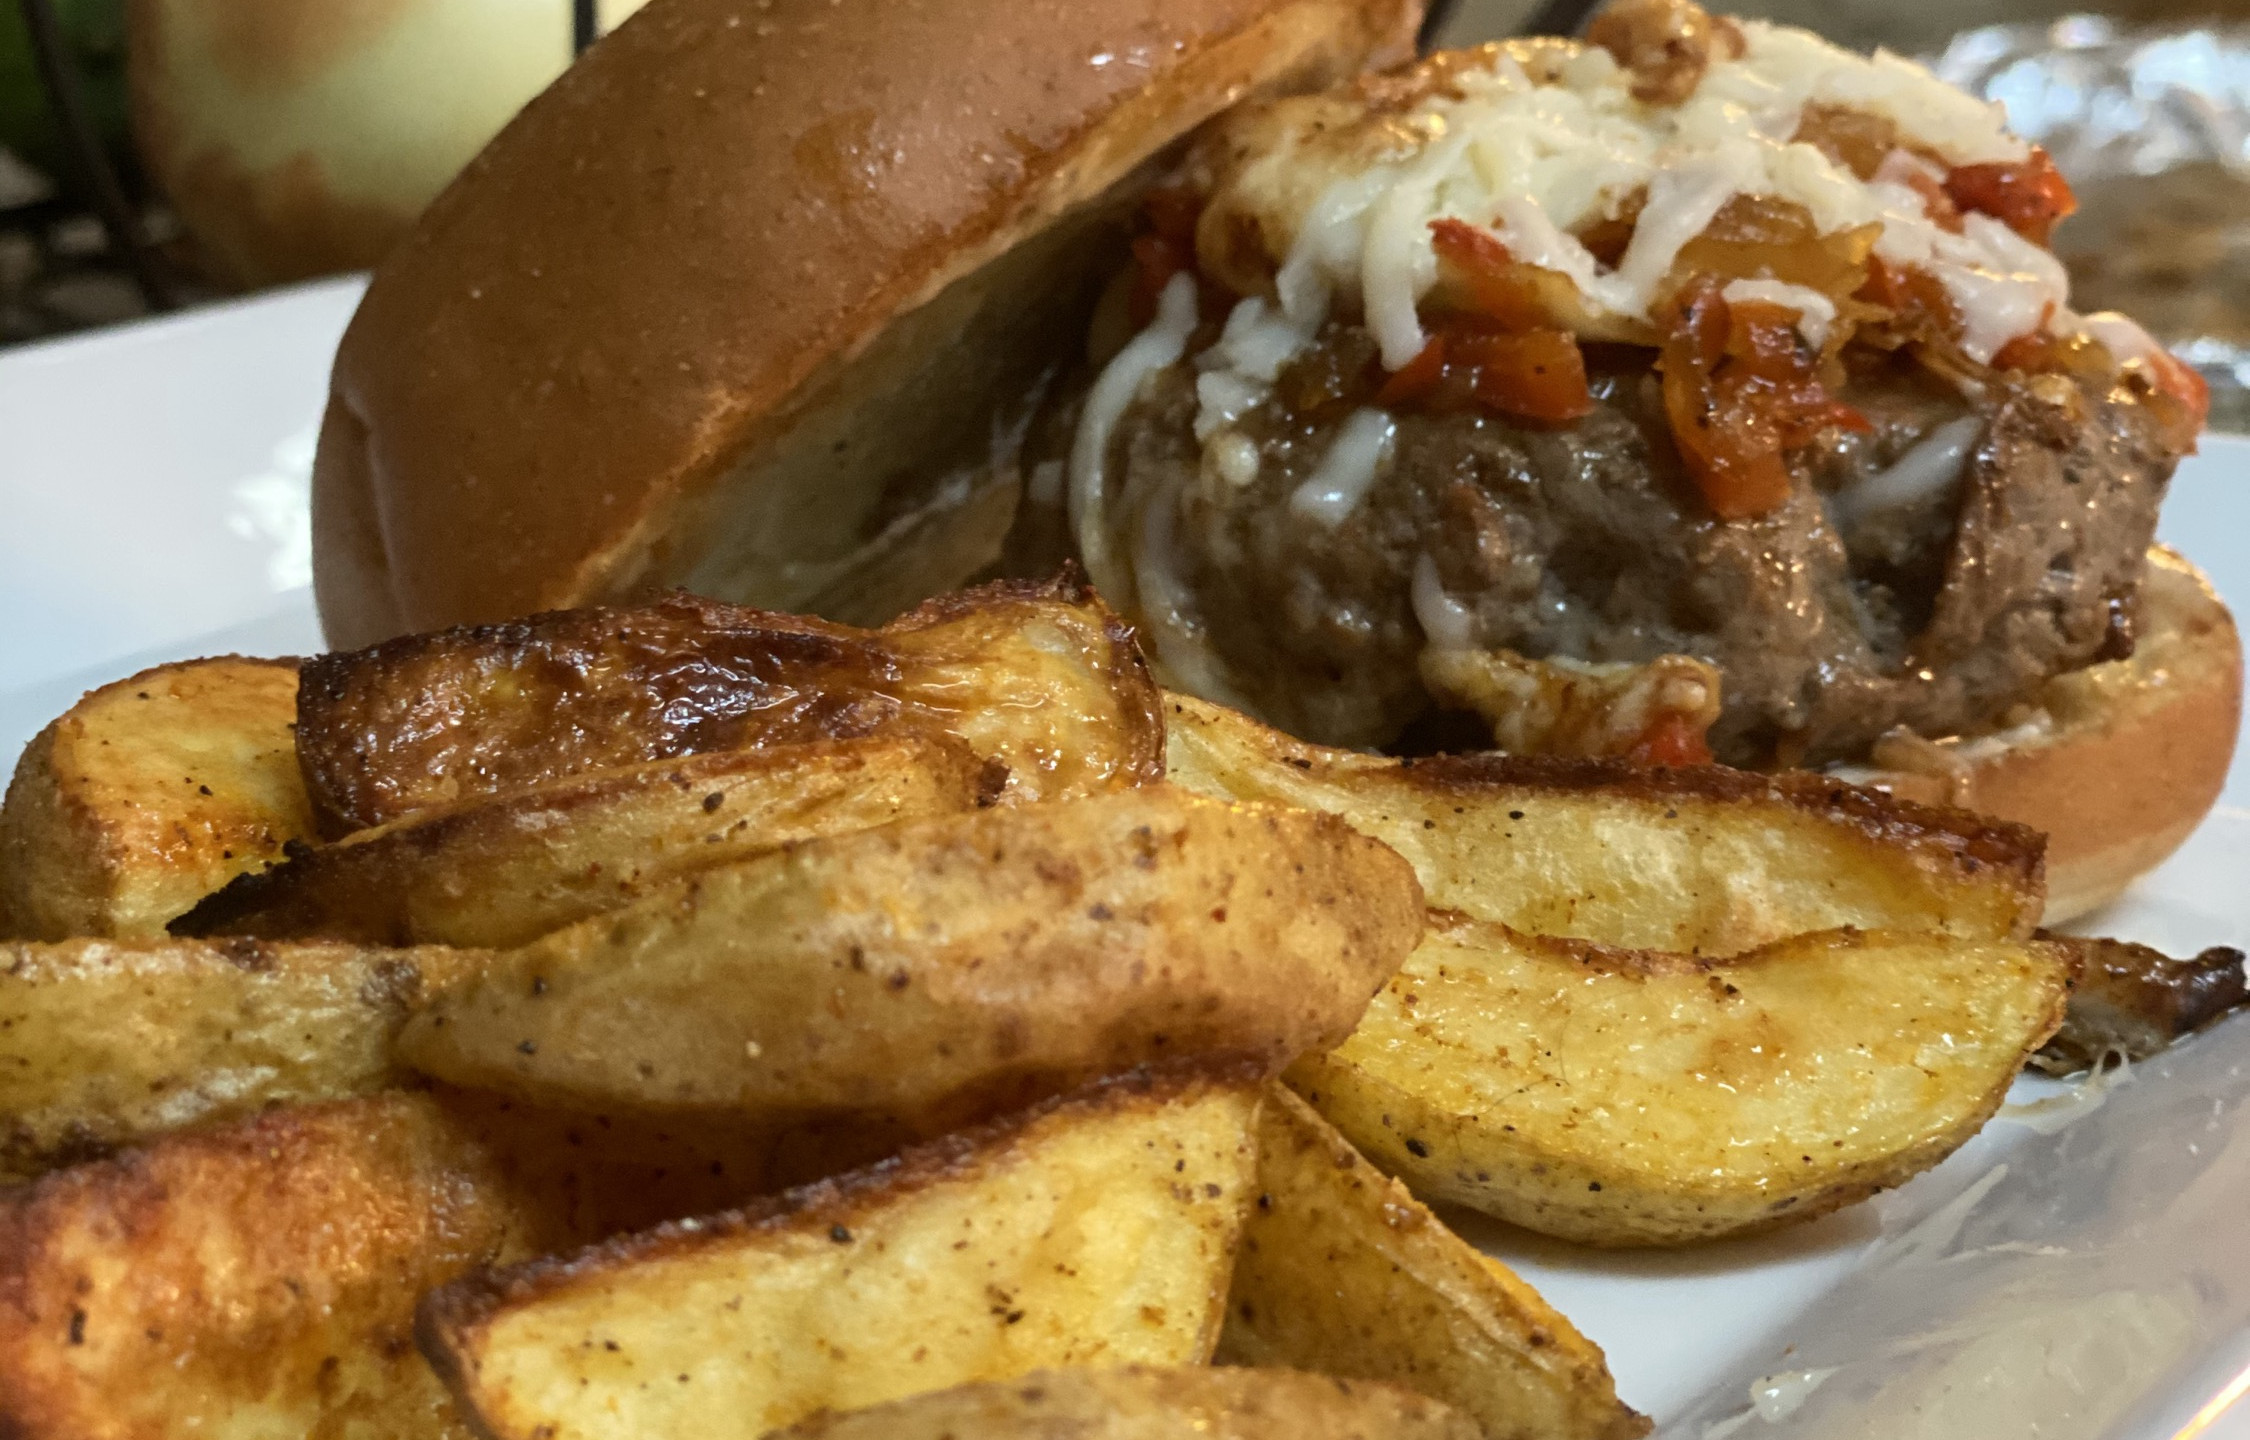 Mangia mozzarella burger with pepper relish, garlic aioli and potato wedges